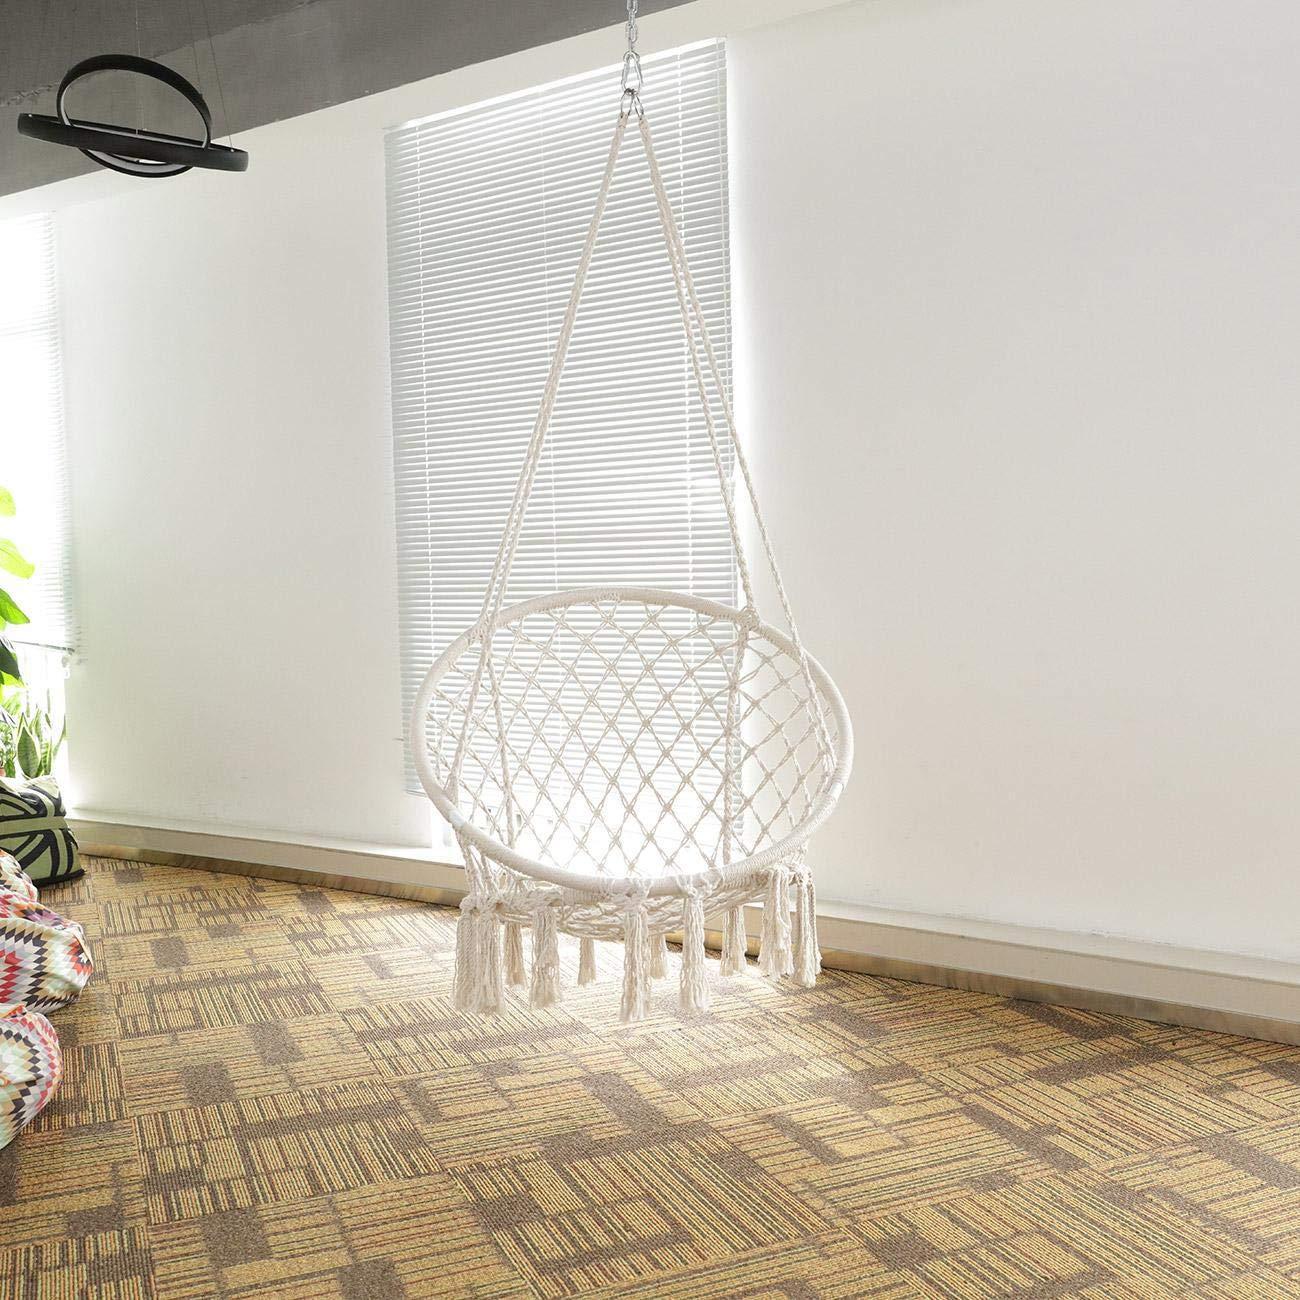 BEAMNOVA 265 lbs Capacity Hammock Chair with Hanging Hardware for Indoor Outdoor Beige by BEAMNOVA (Image #2)